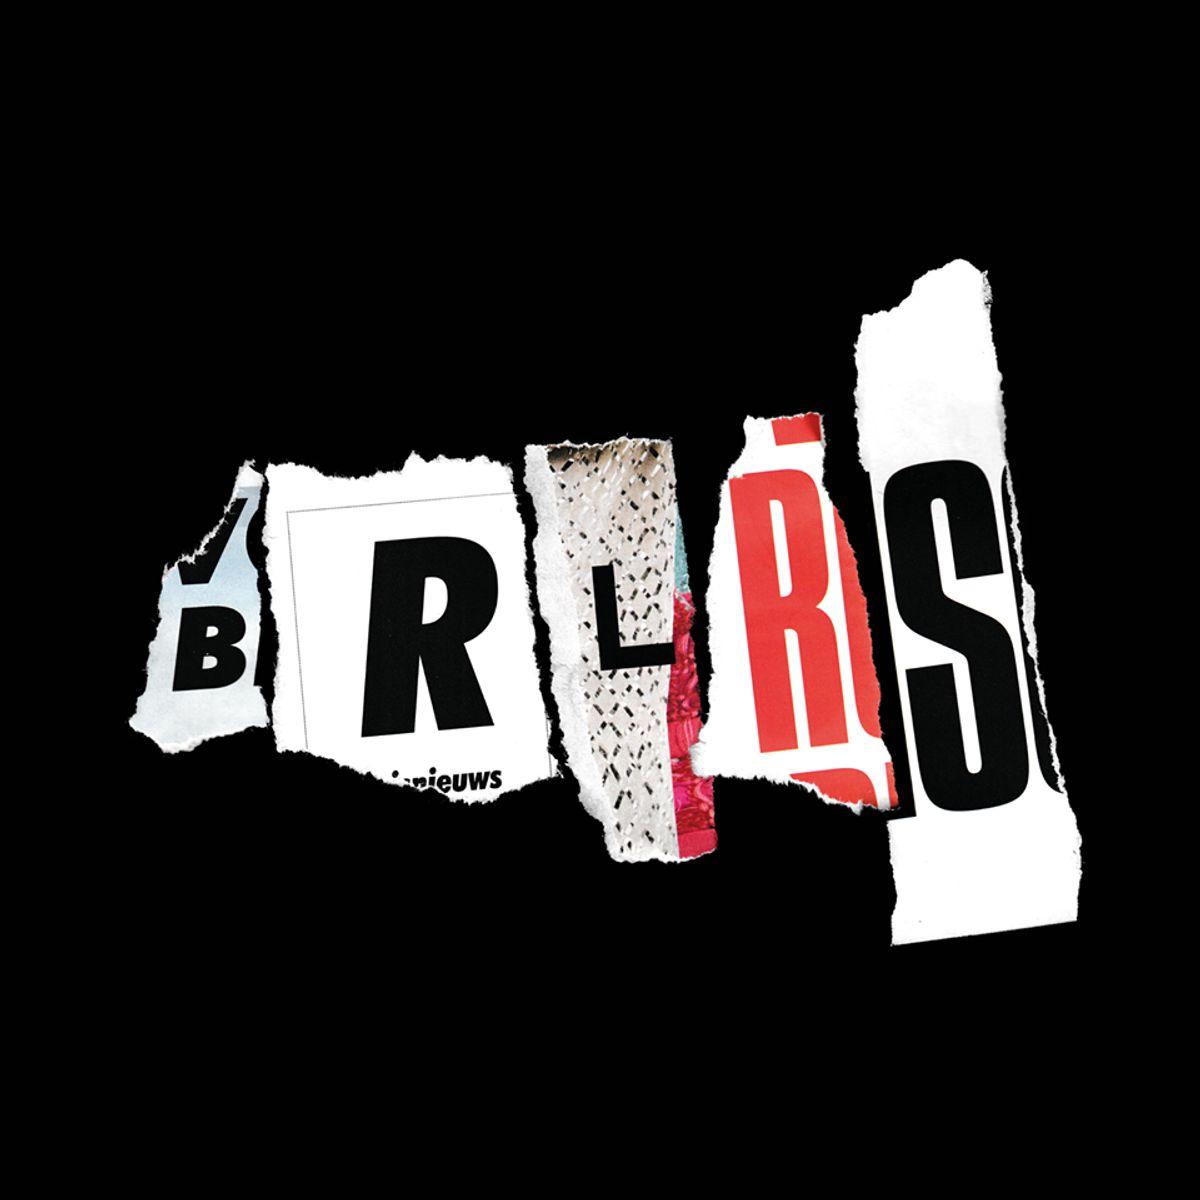 BRLRS - 'BRLRS'